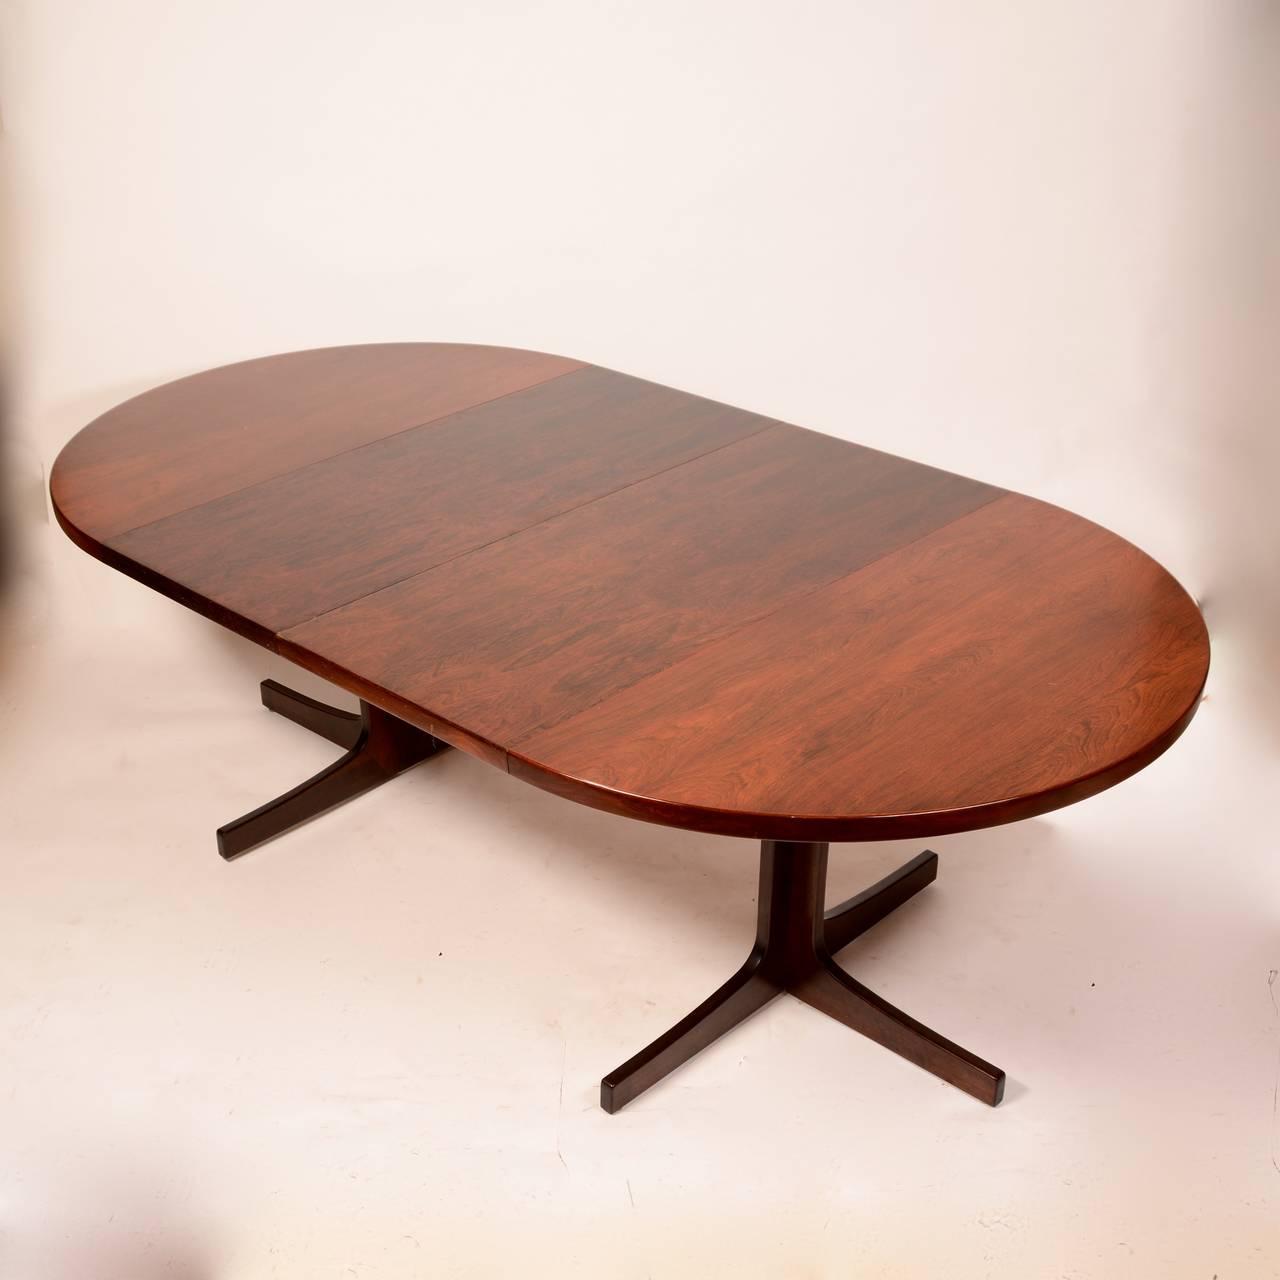 Mid-Century Modern Skovmand & Andersen for Moreddi Rosewood Dining Table 5